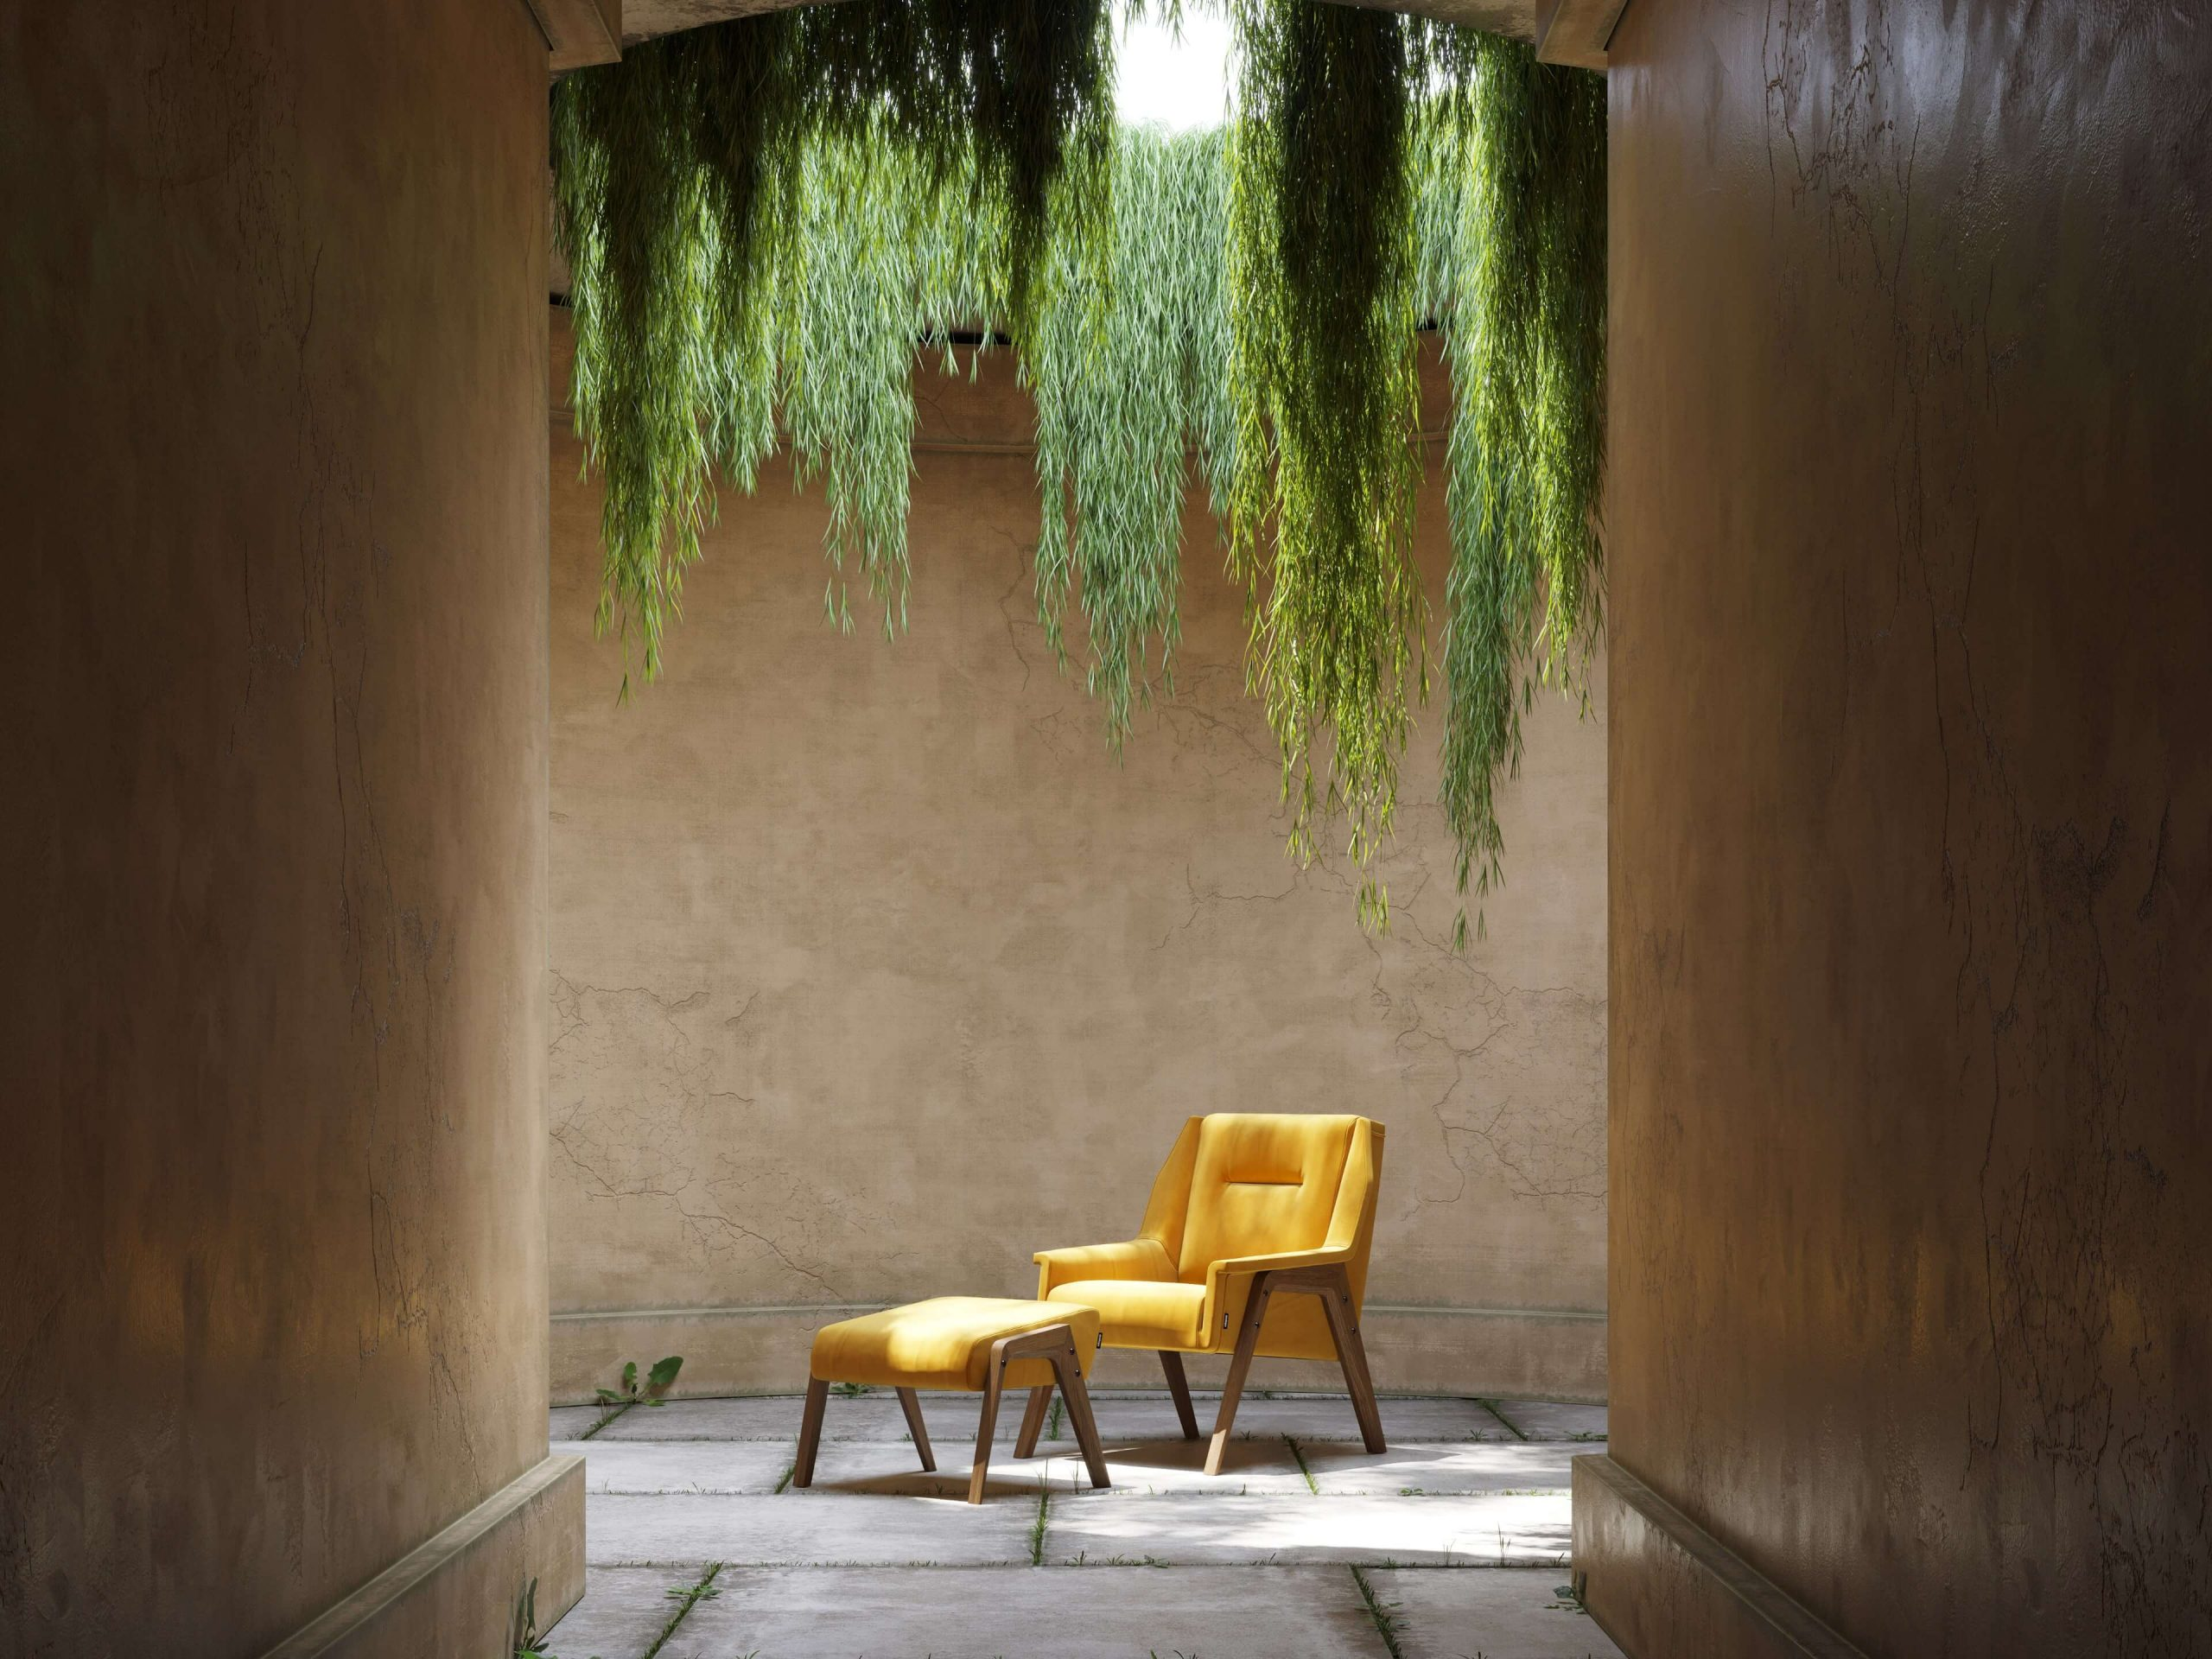 greta-maple-armchair-cotton-velvet-mostaza-wood-domkapa-upholstered-furniture-living-room-seating-piece-5